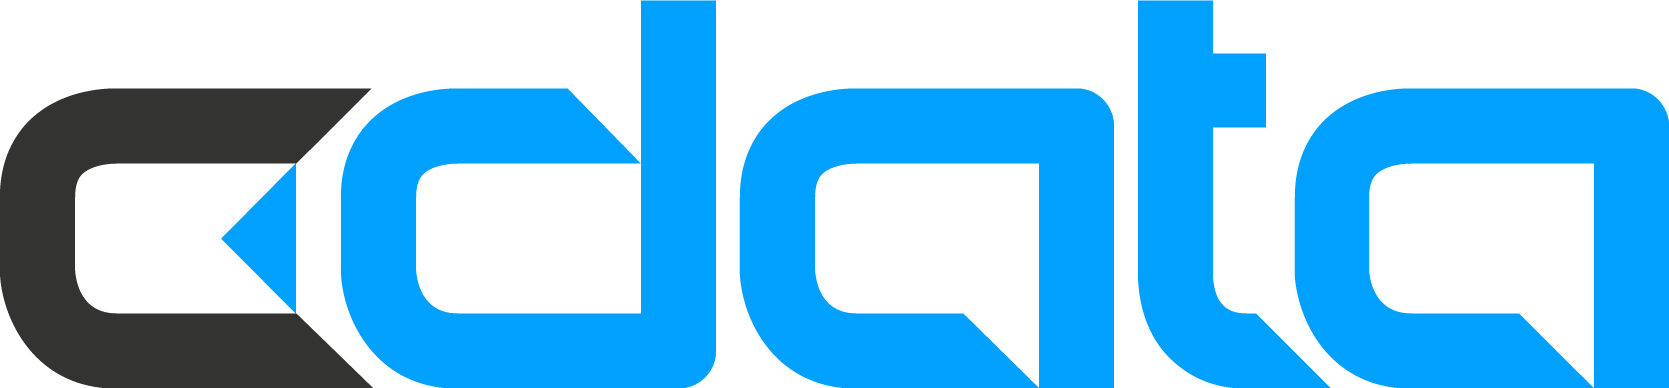 cdata logo